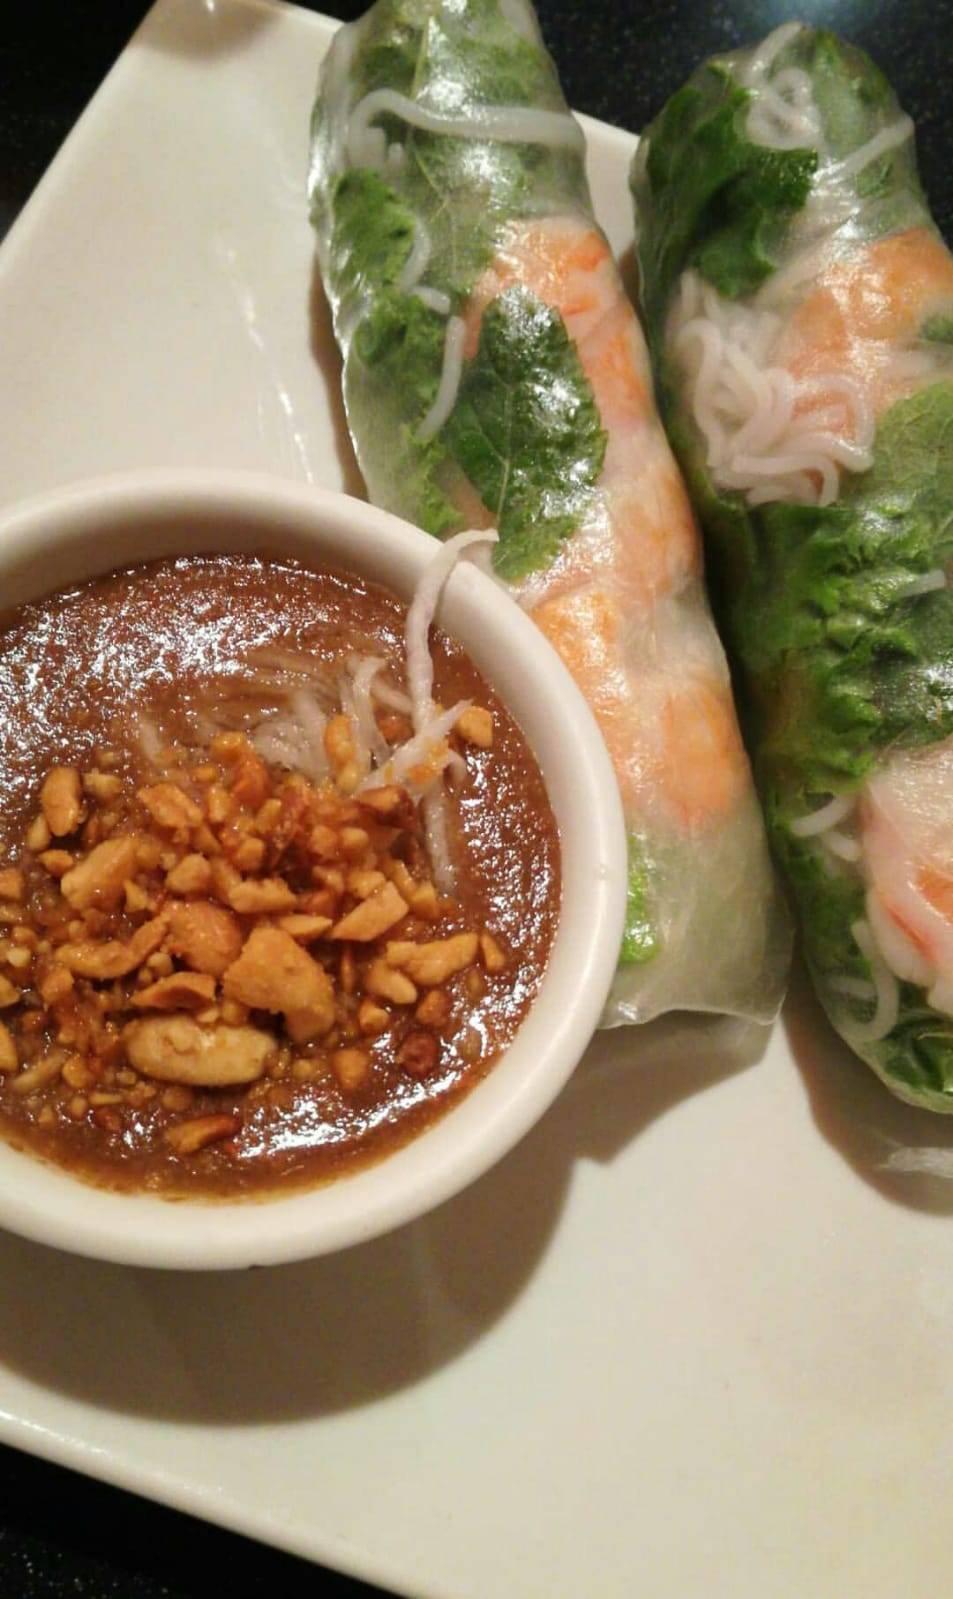 Pho Vinh Long Vietnamese Restaurant 4808 N 35th Ave Phoenix Az 85017 Usa